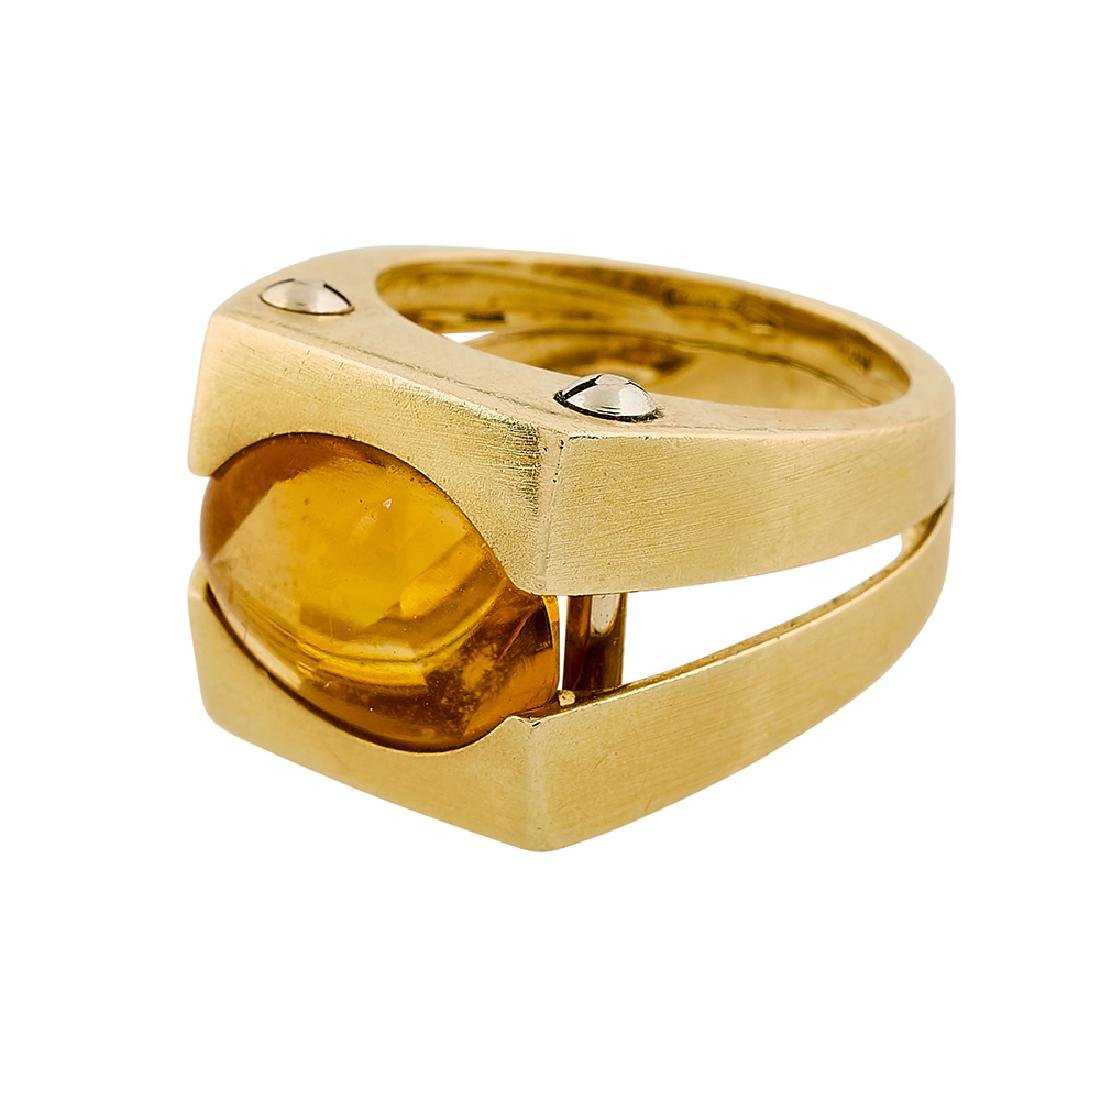 Roberto Coin, Attribution ring